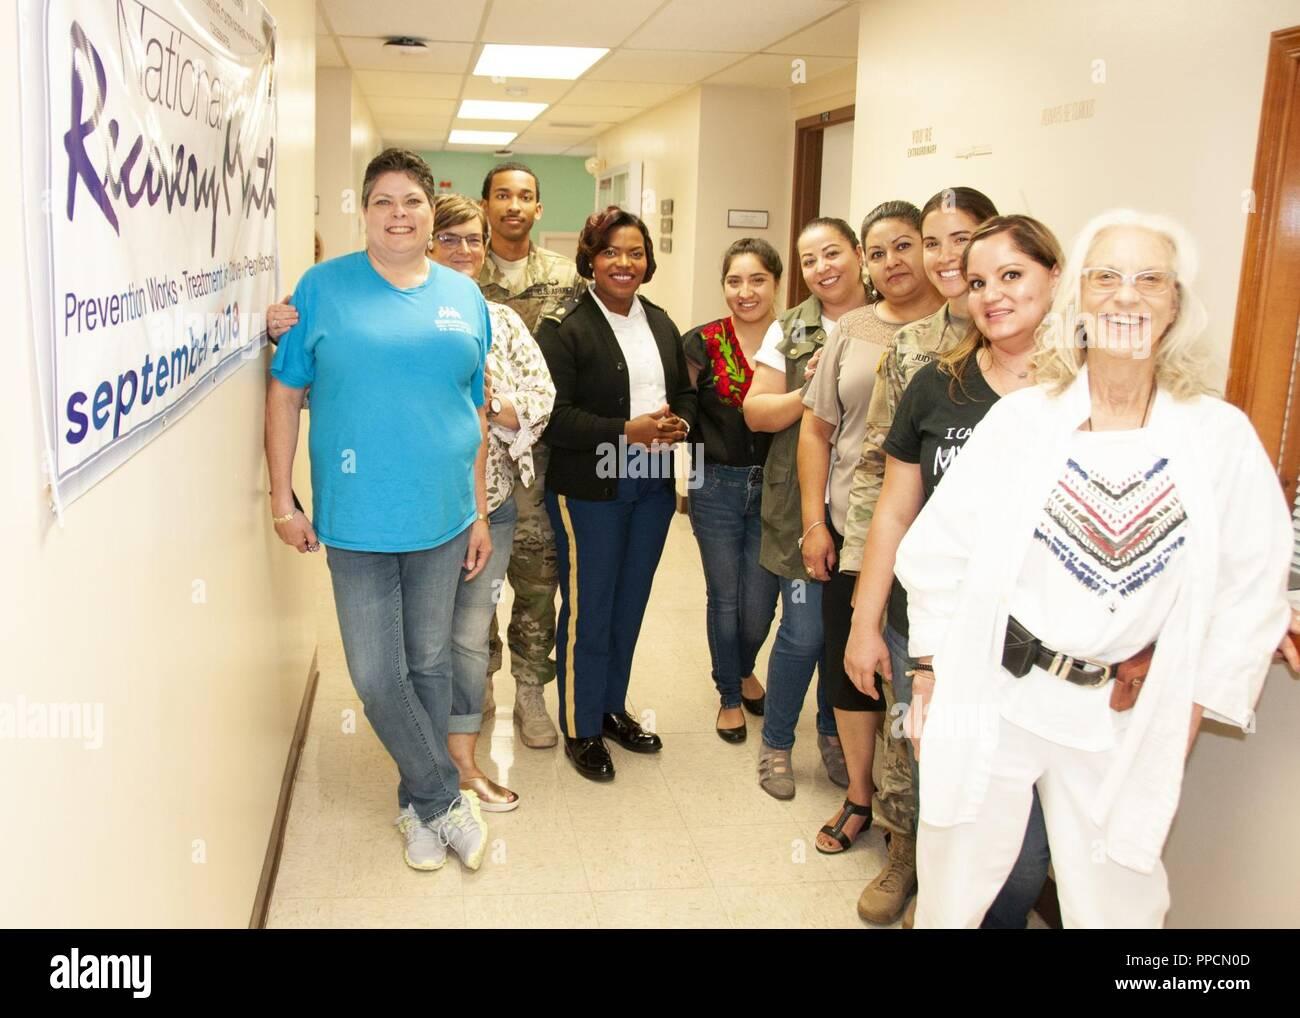 The Fort Bliss Addiction Medicine Intensive Outpatient Program